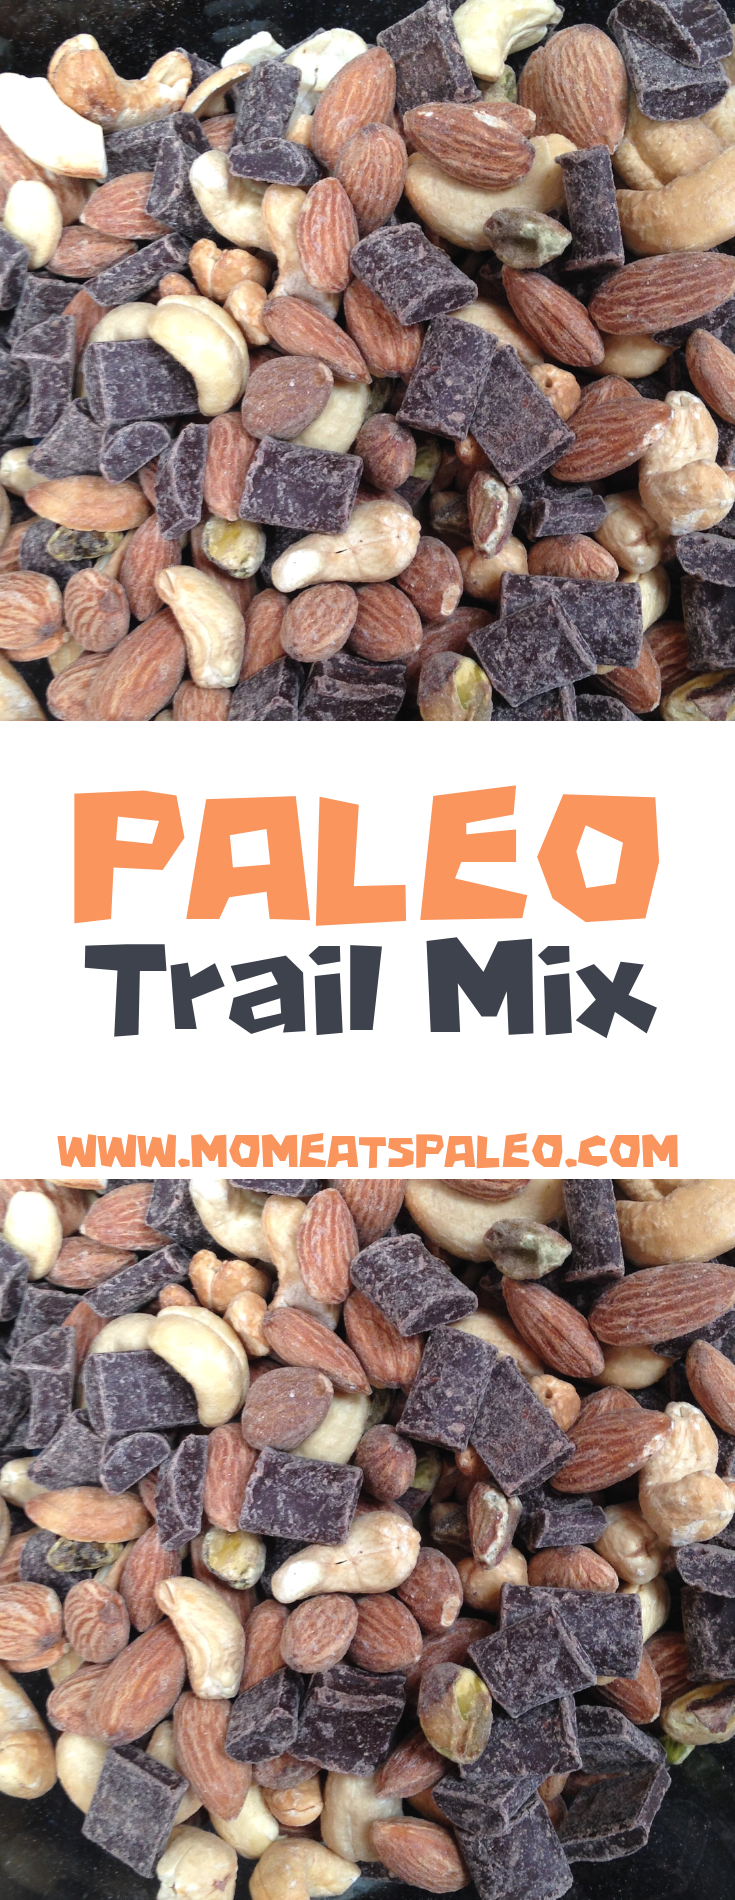 Paleo Trail Mix images